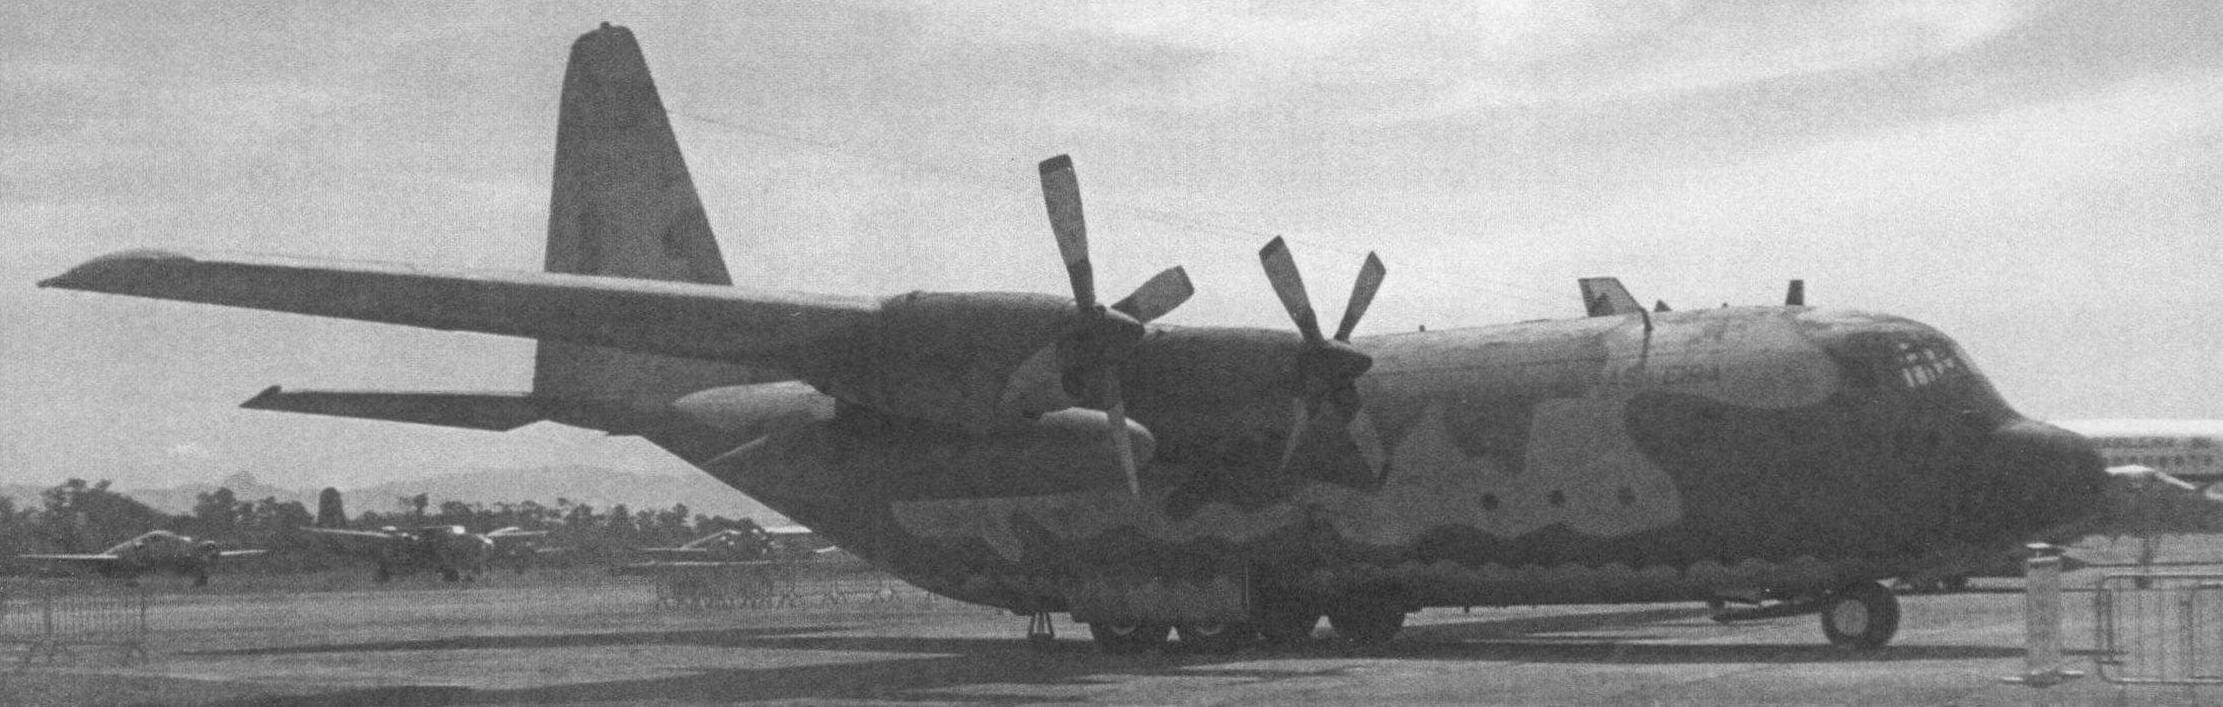 Локхид «Геркулес» ВВС Бразилии